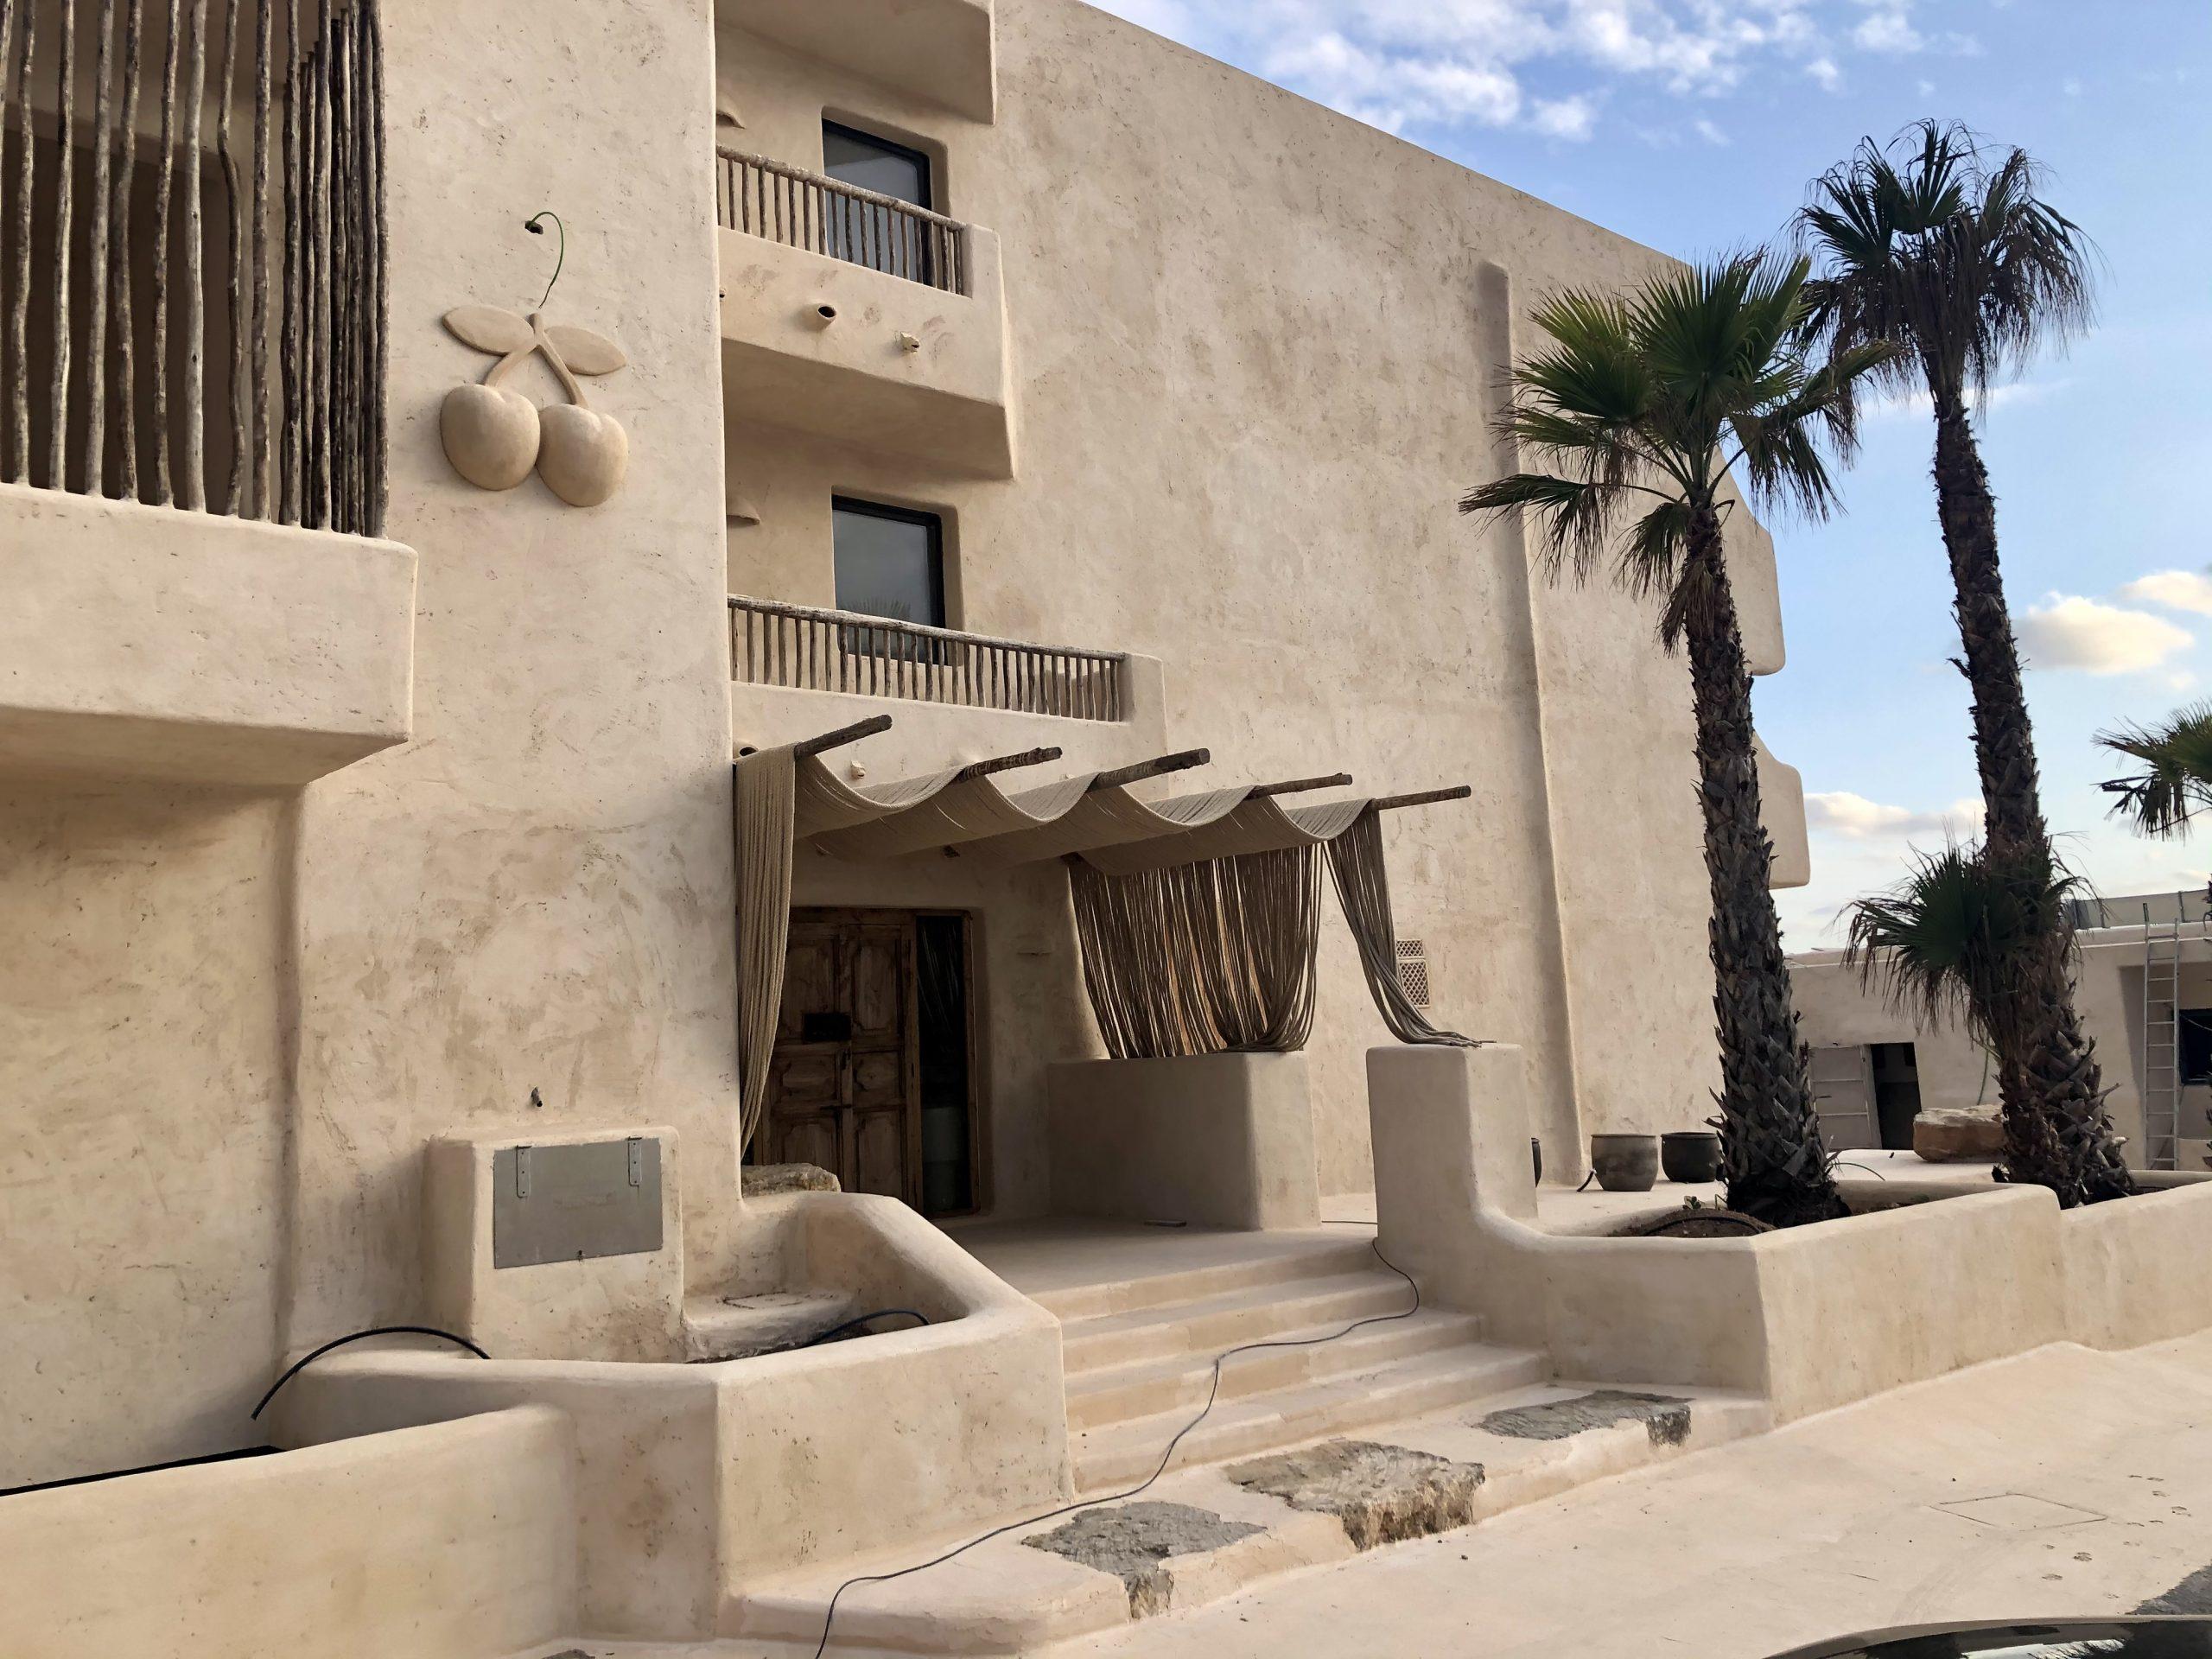 Casa Pacha obrirà el pròxim 20 de maig a Migjorn - Formentera Radio